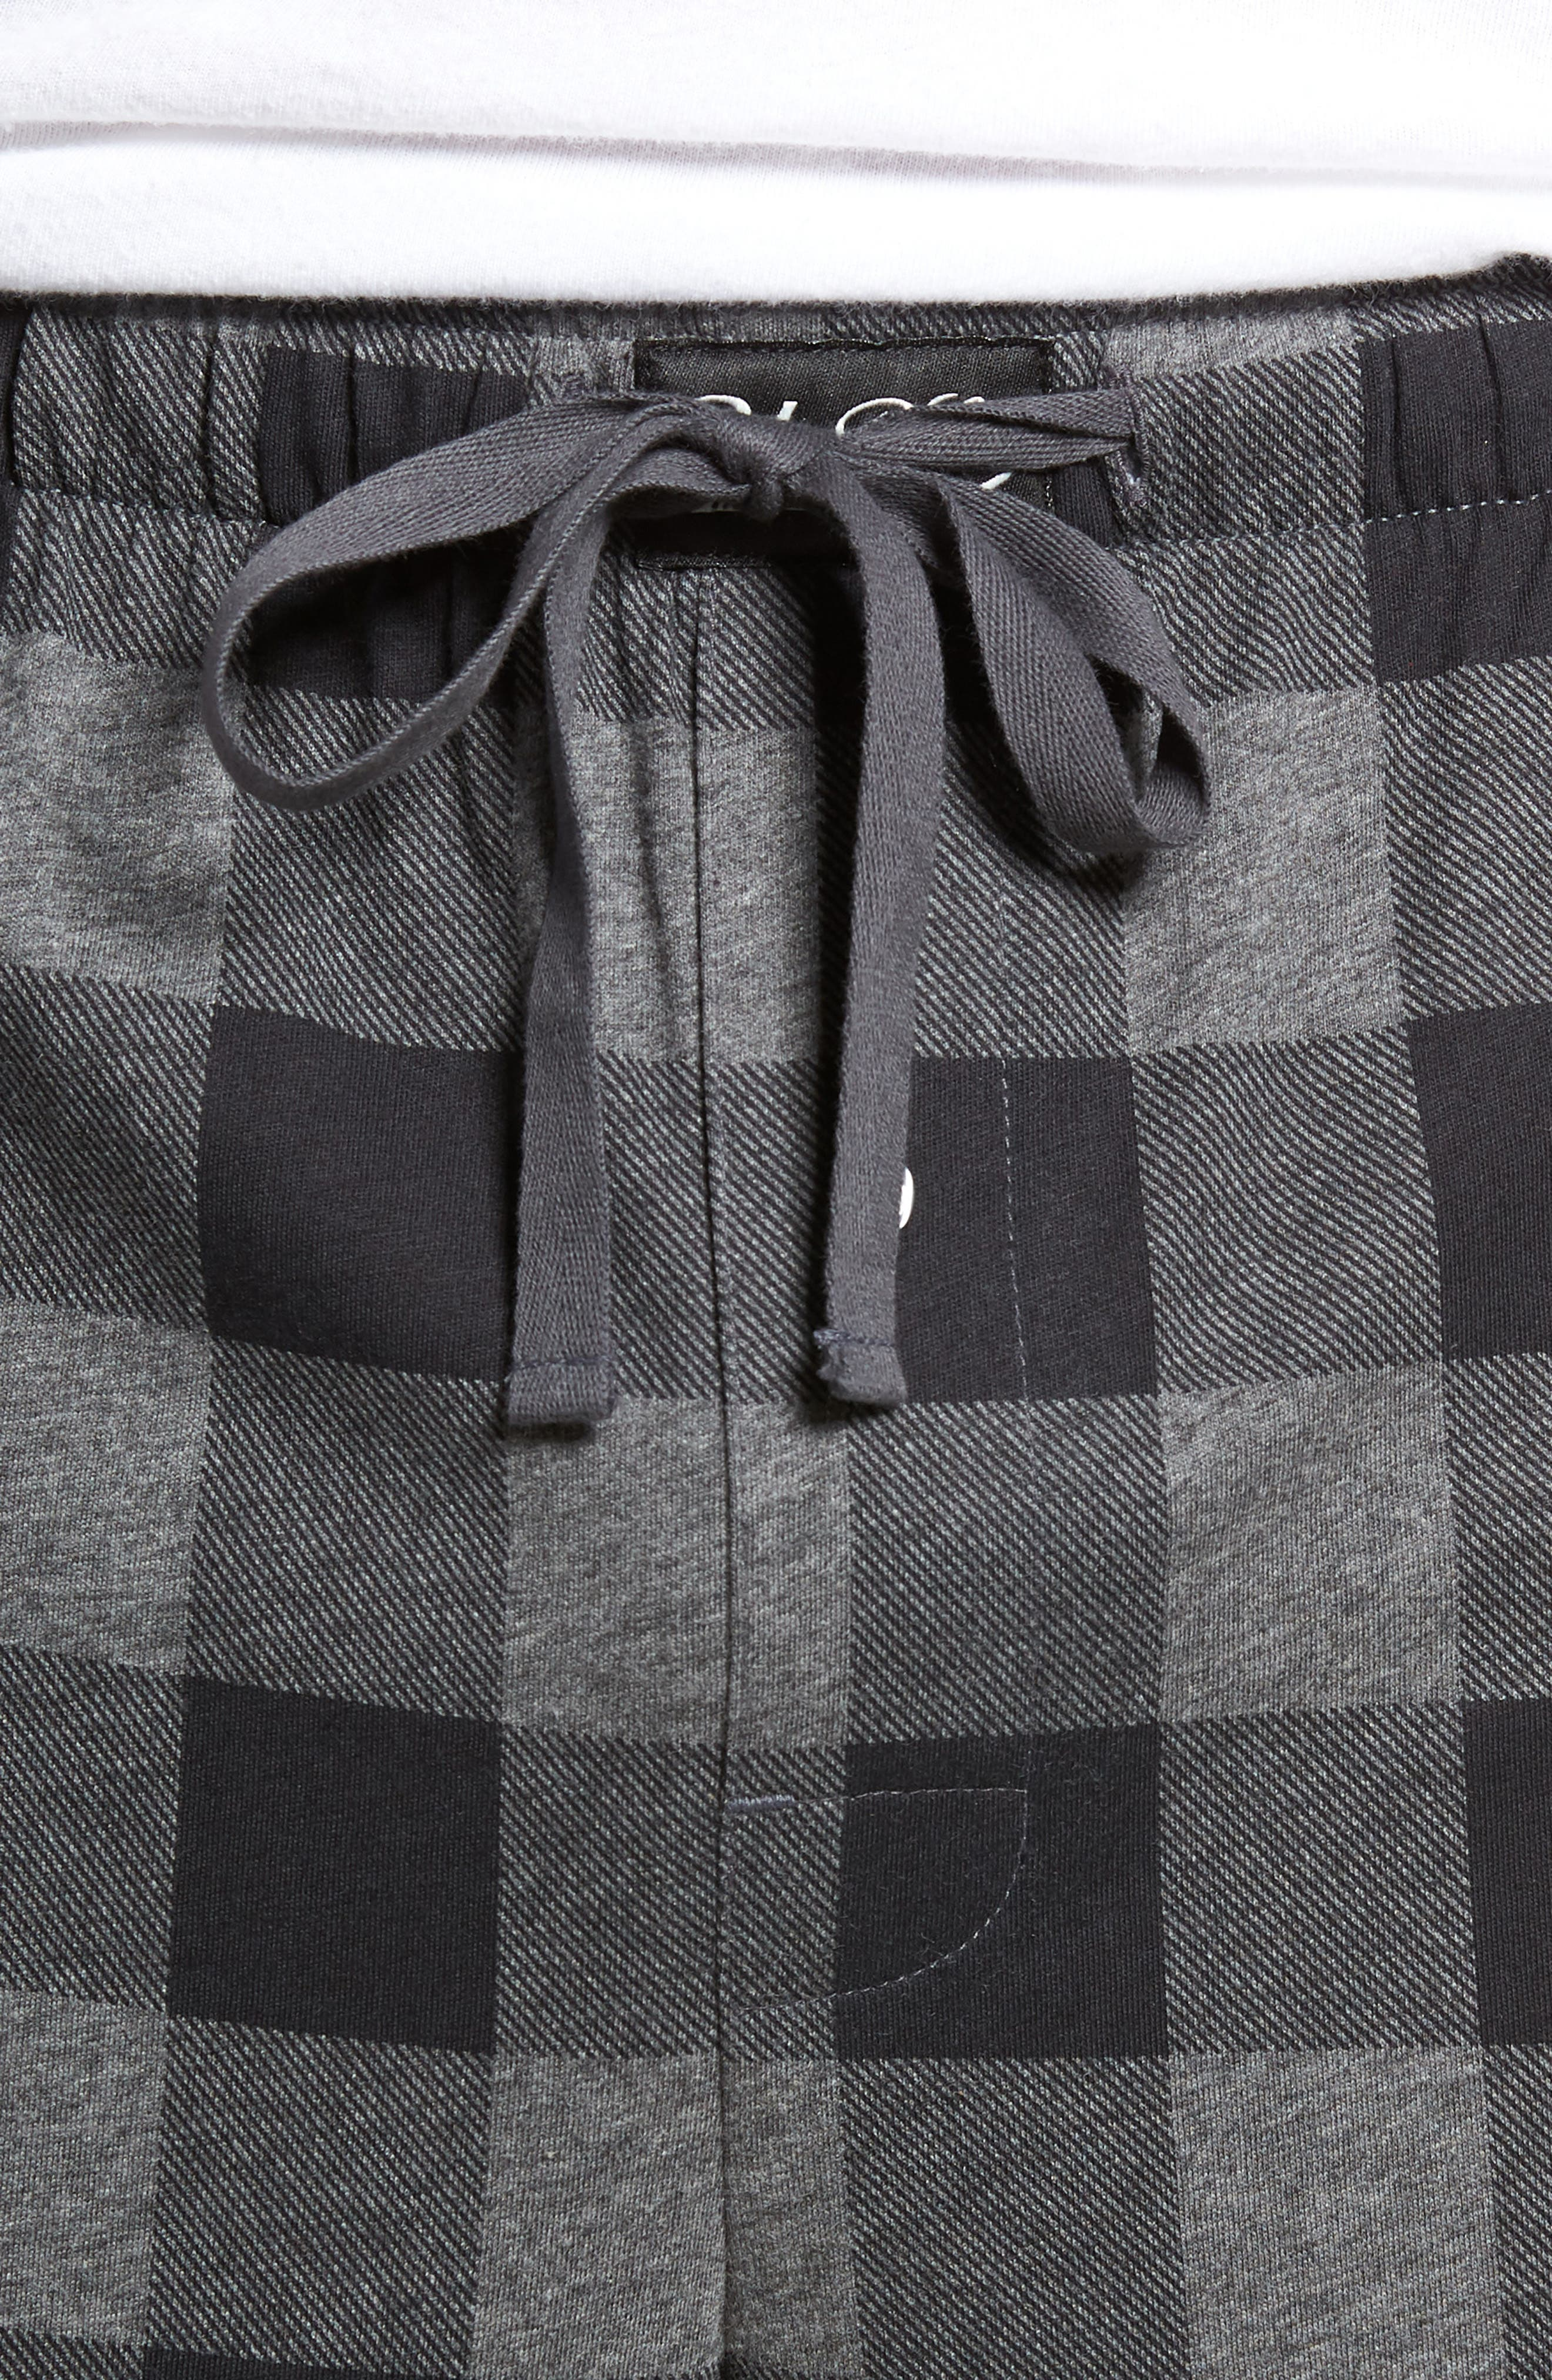 Cotton Lounge Pants,                             Alternate thumbnail 4, color,                             CHARCOAL/ BUFFALO PLAID